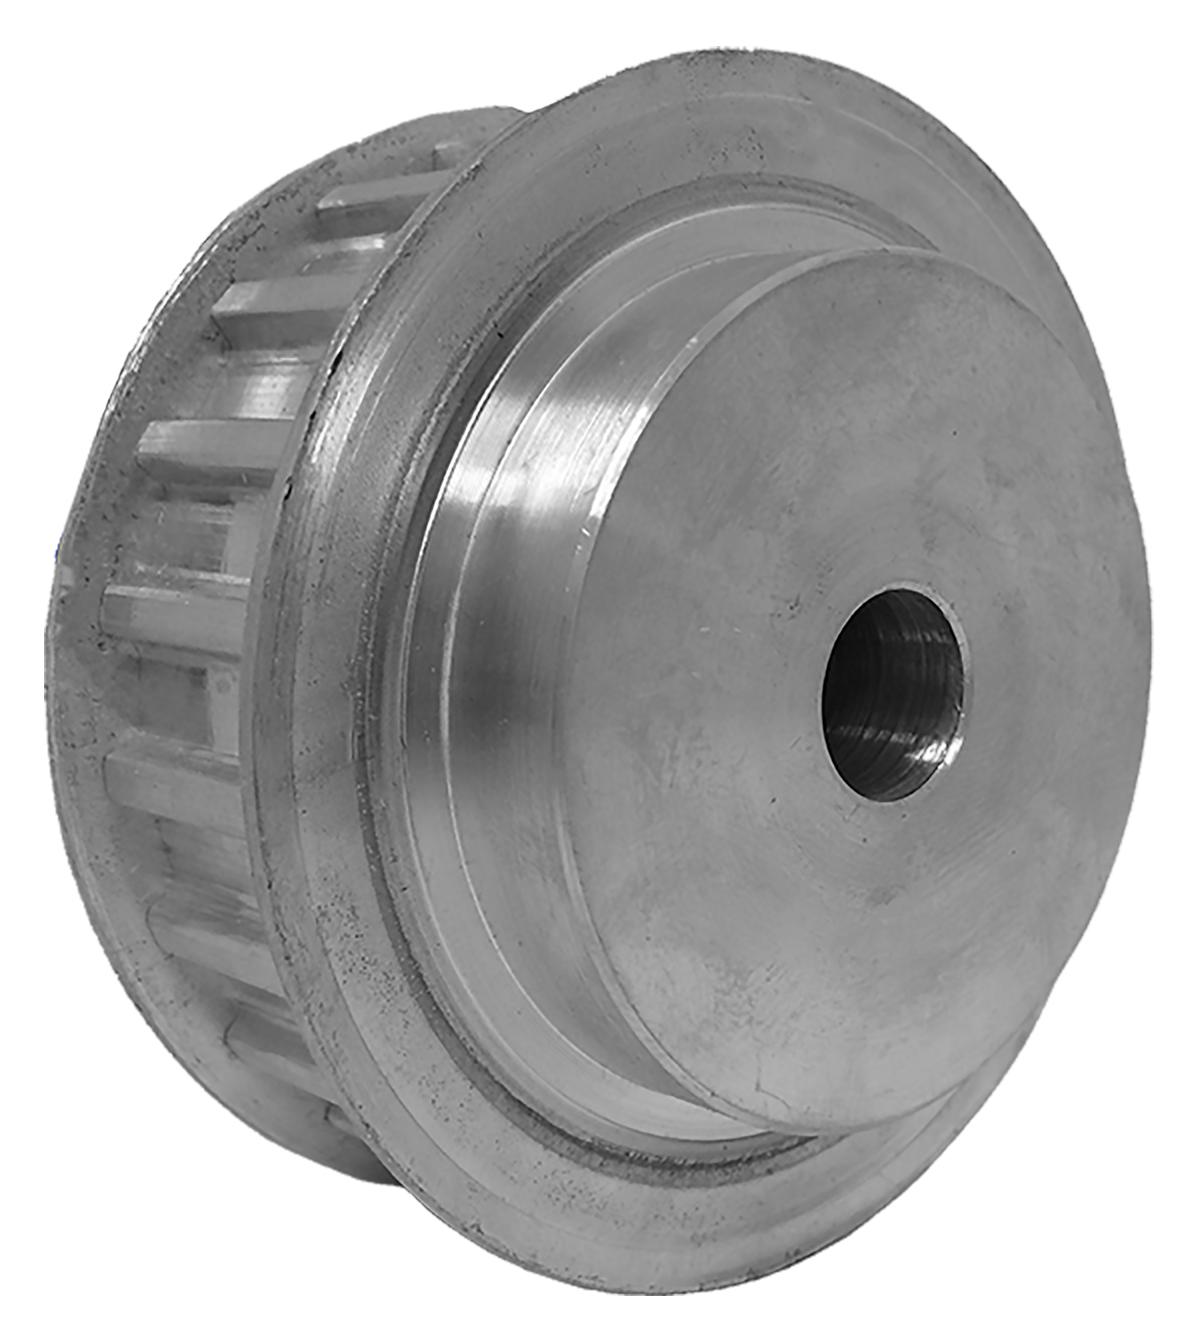 31AT10/22-2 - Aluminum Metric Pulleys